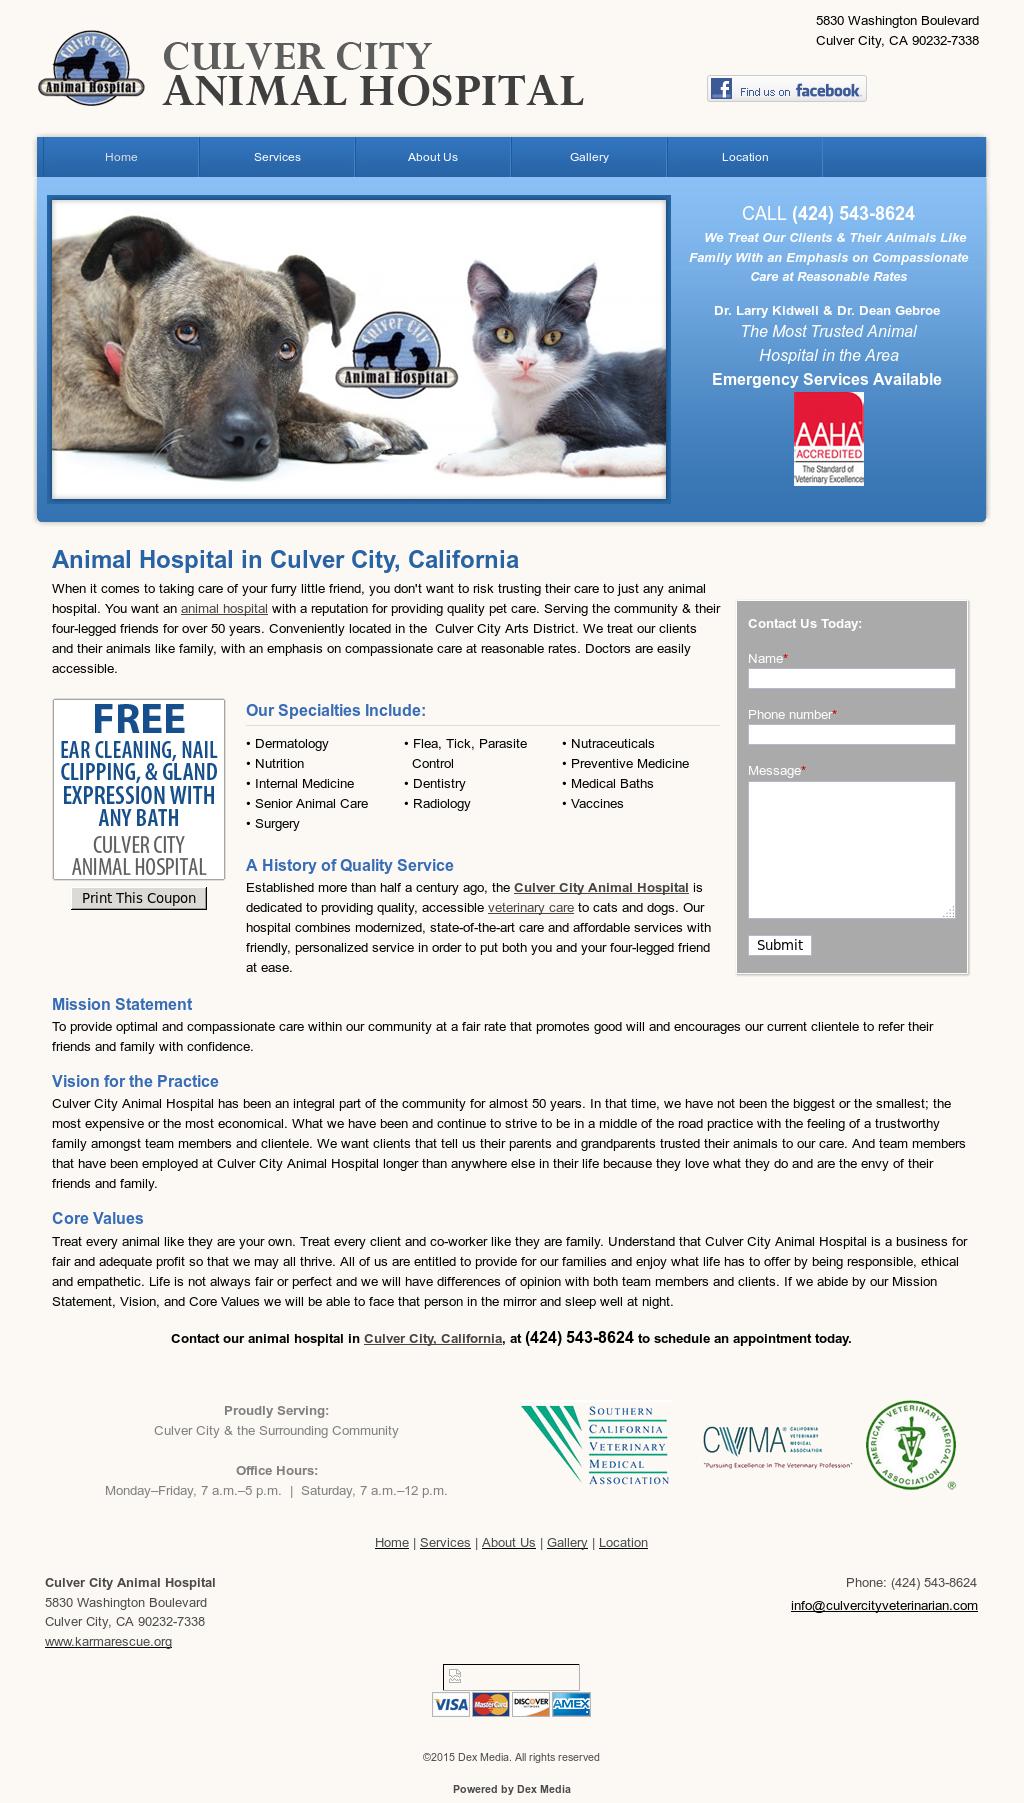 Culver City Animal Hospital Competitors, Revenue and